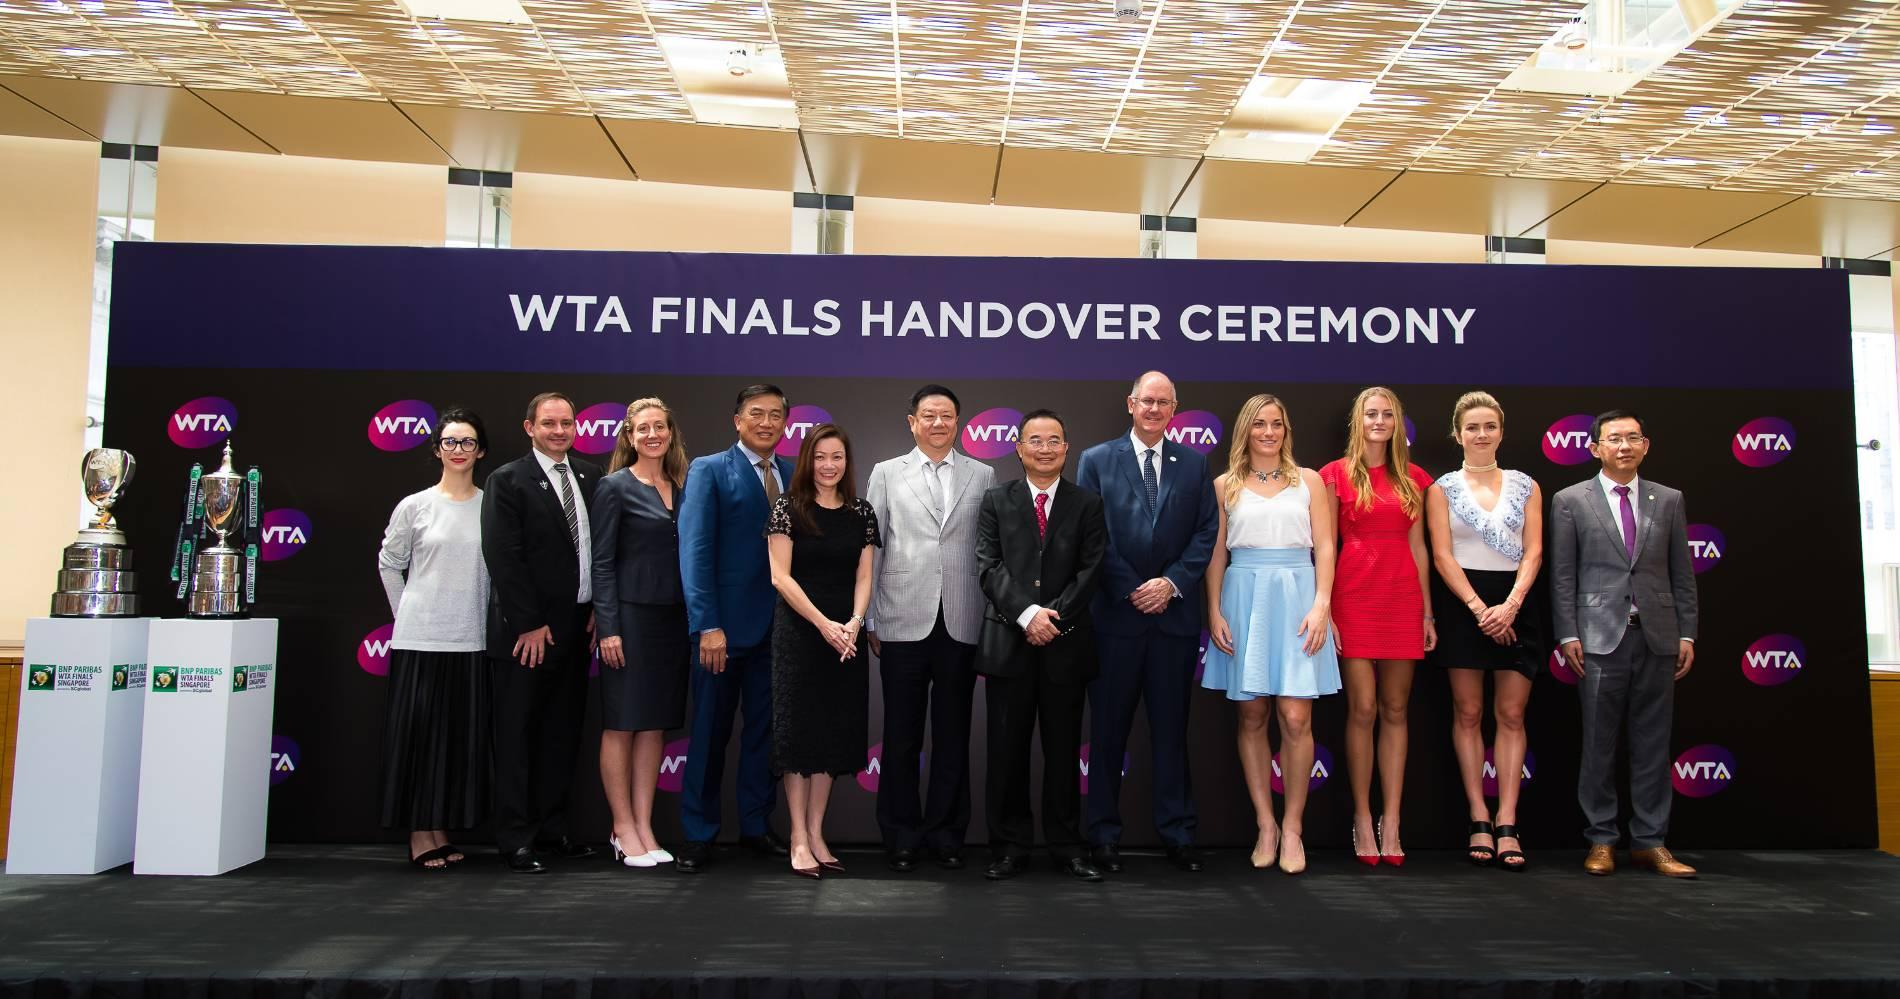 WTA - Steve Simon